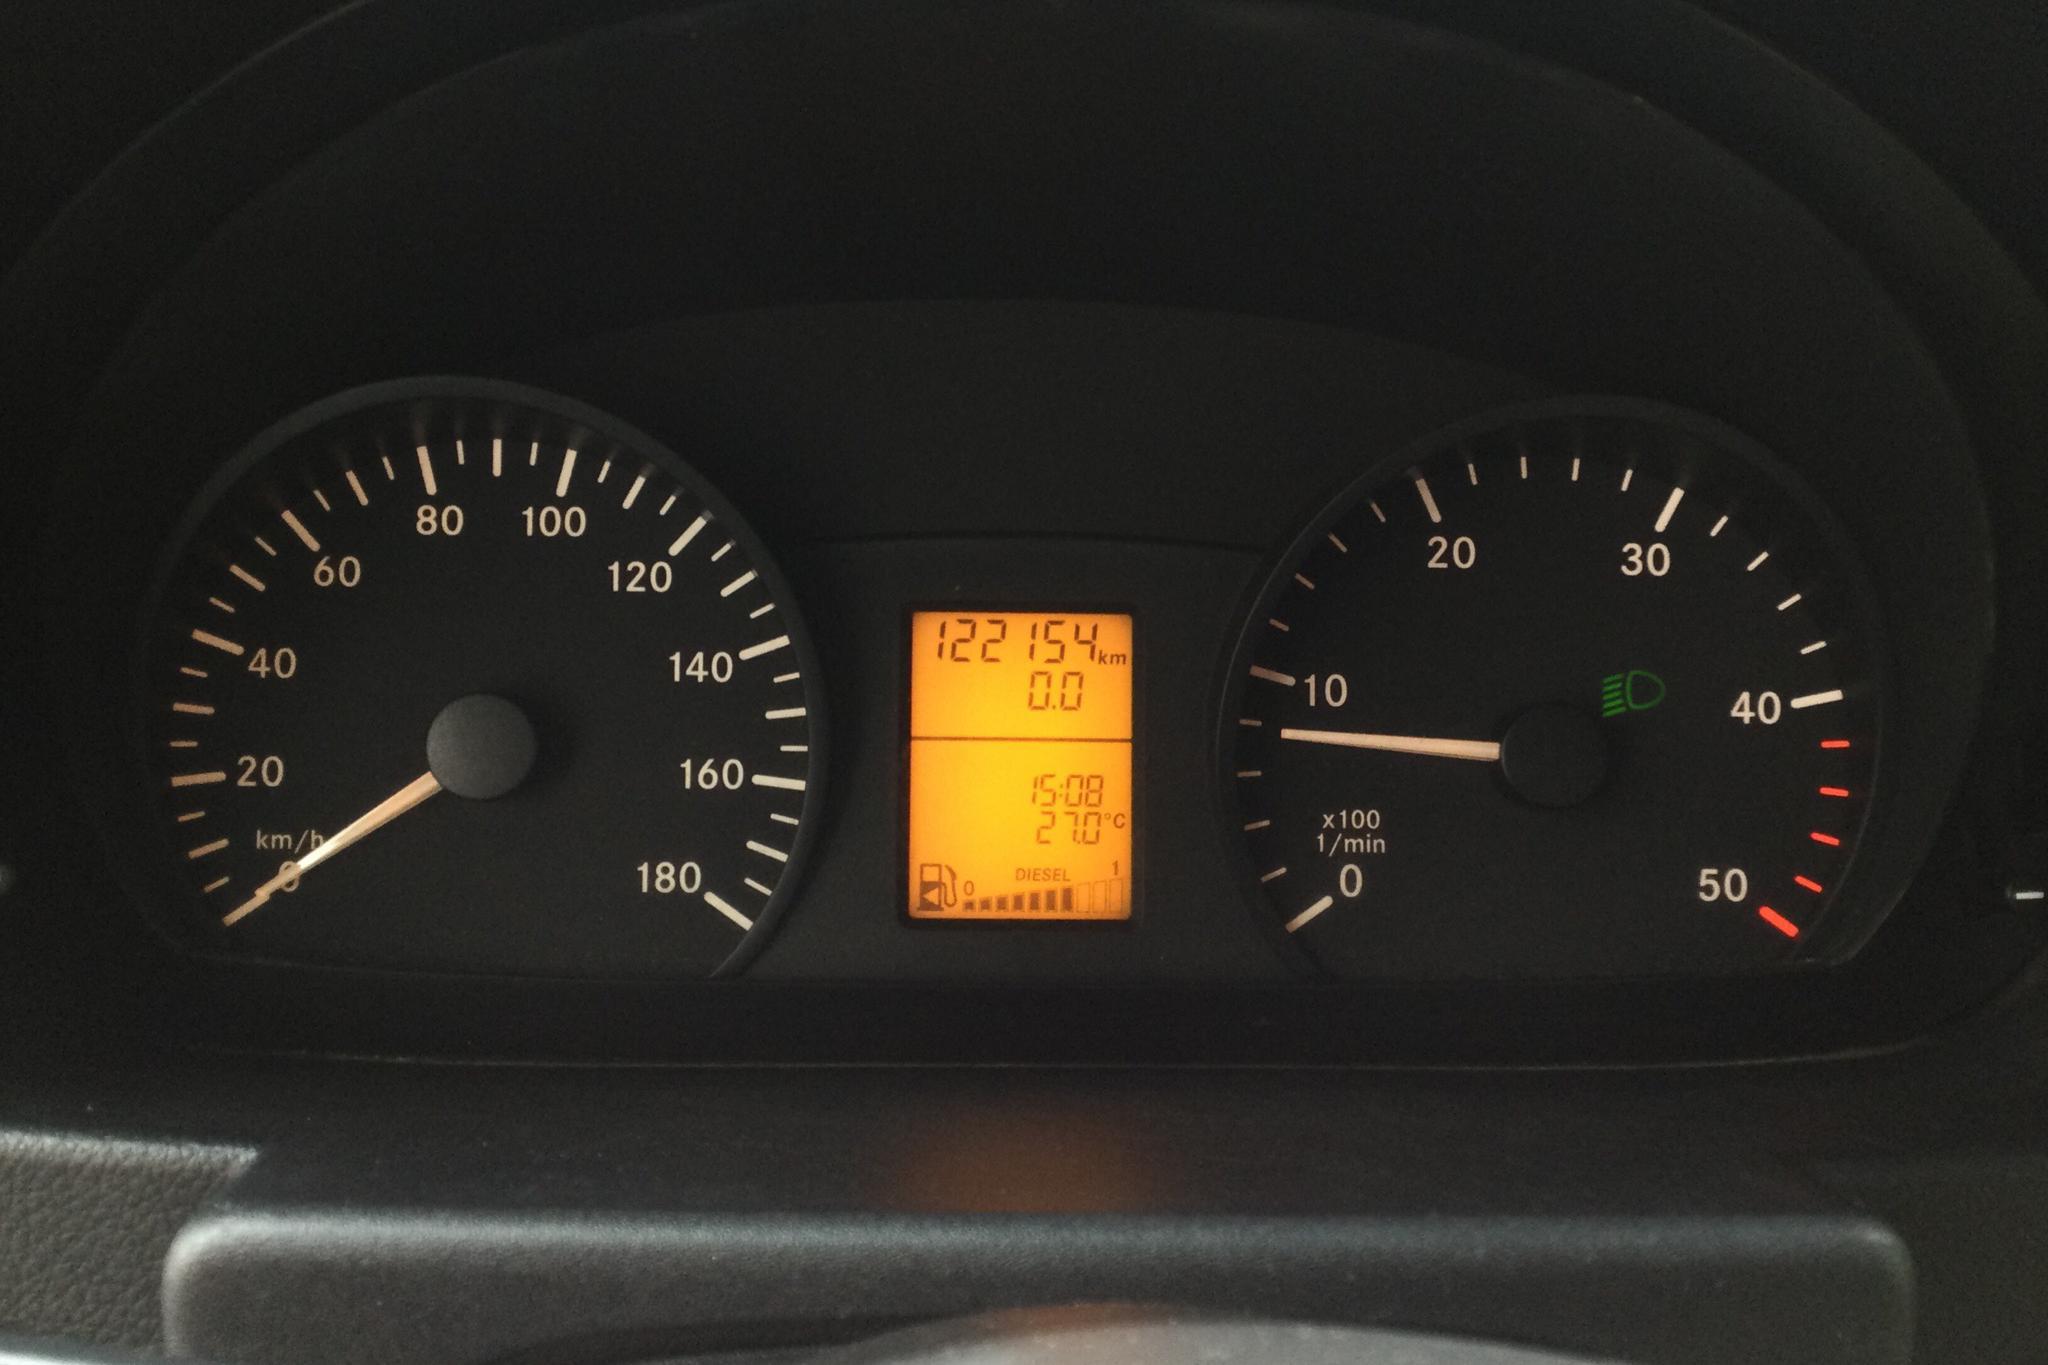 Mercedes Sprinter 316 CDI (163hk) - 12 215 mil - Manuell - vit - 2012